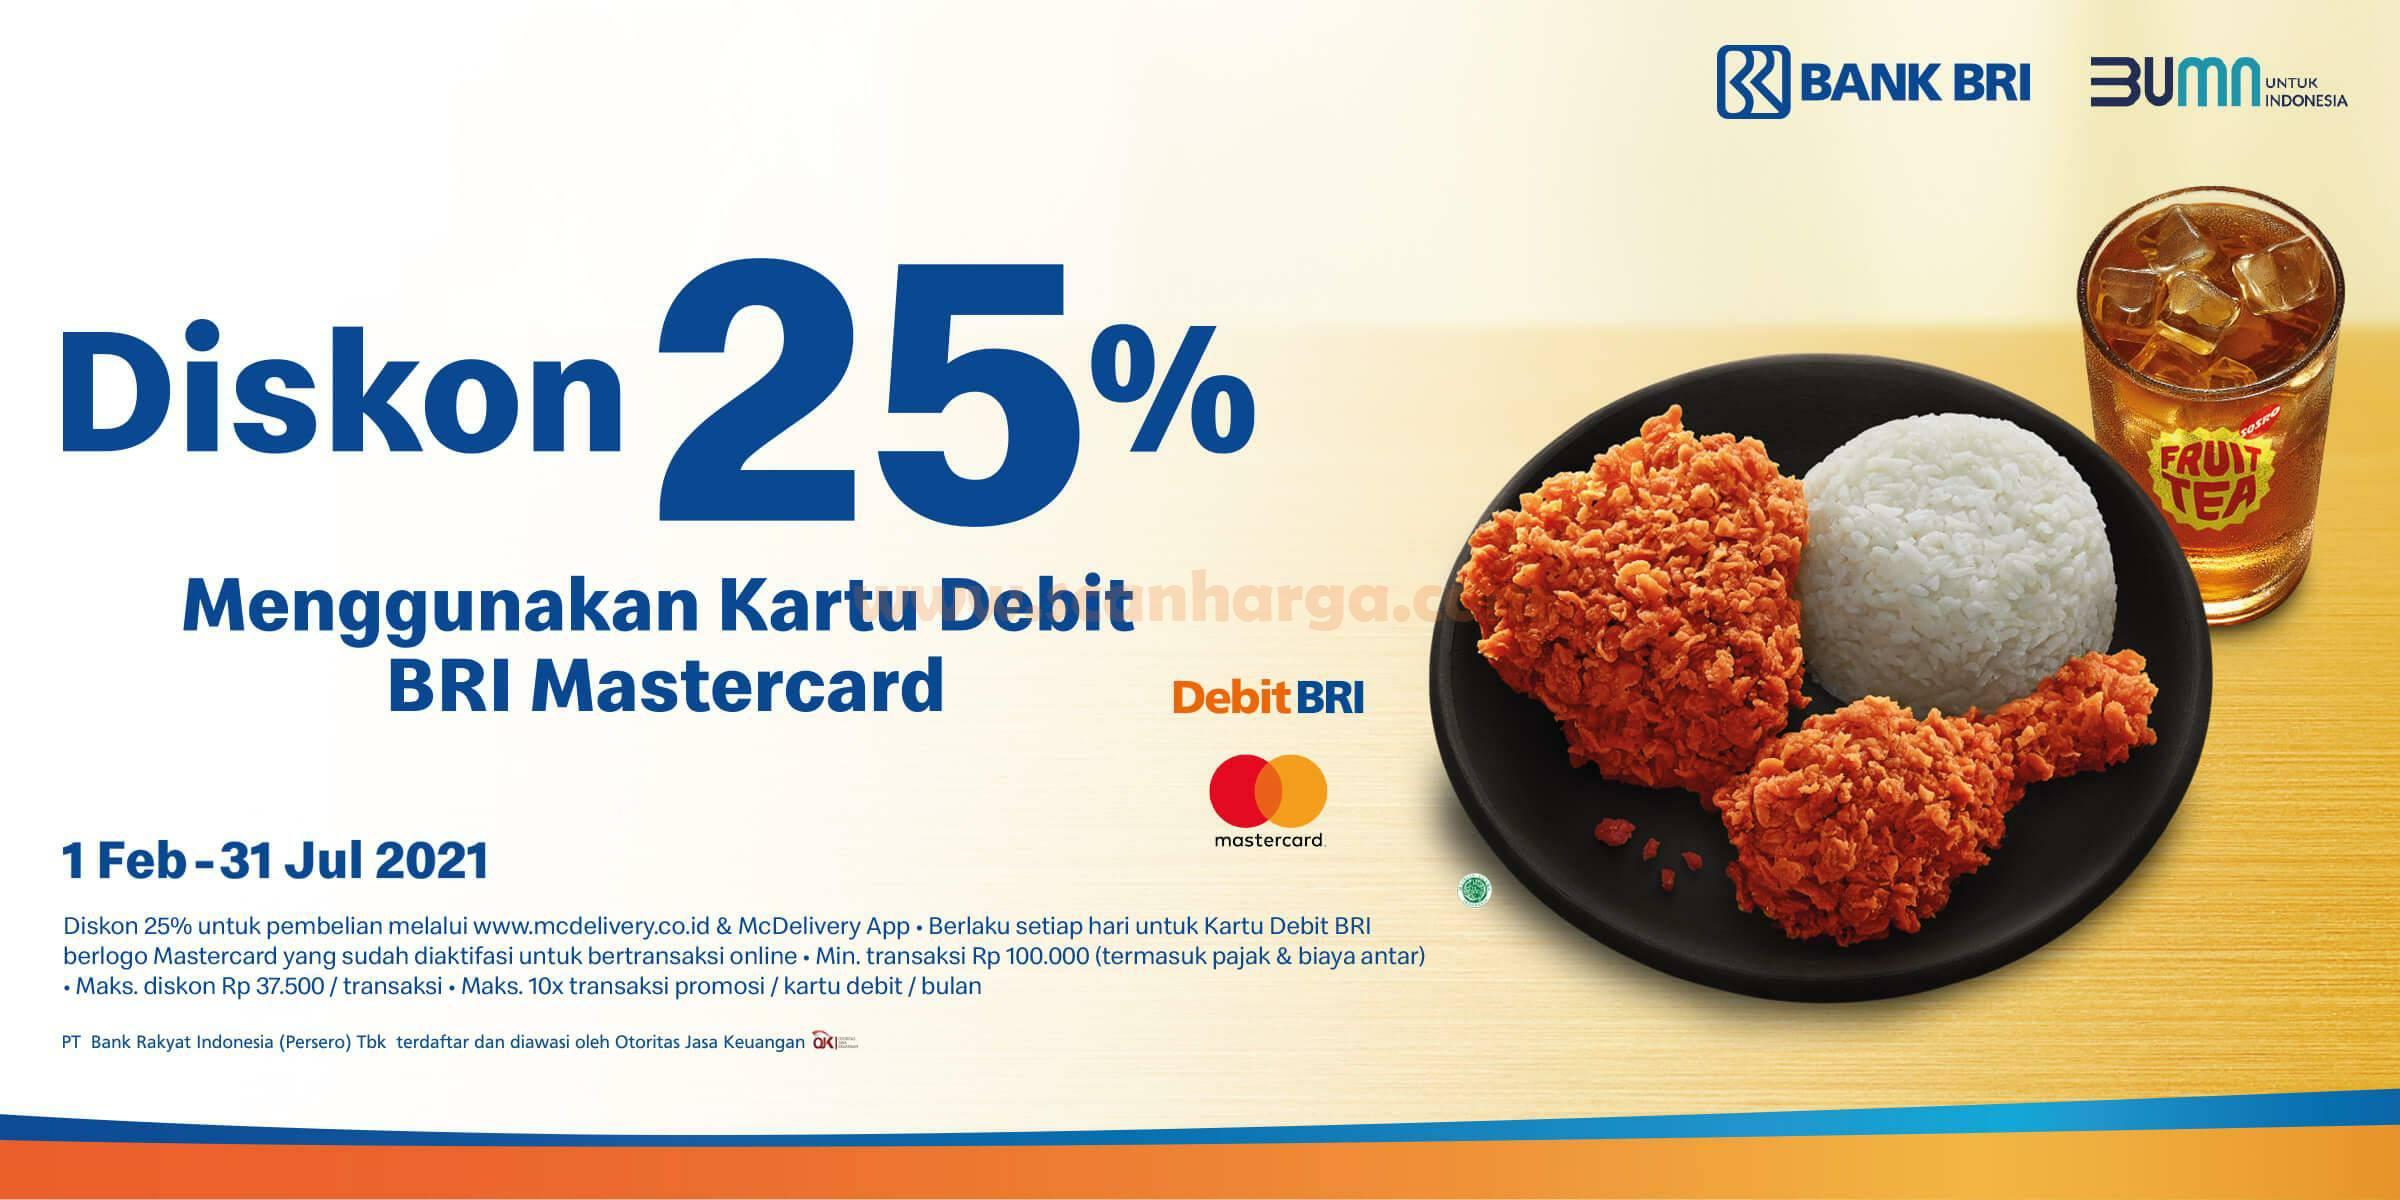 McDonalds Promo Diskon 25% dengan Kartu Debit BRI berlogo Mastercard